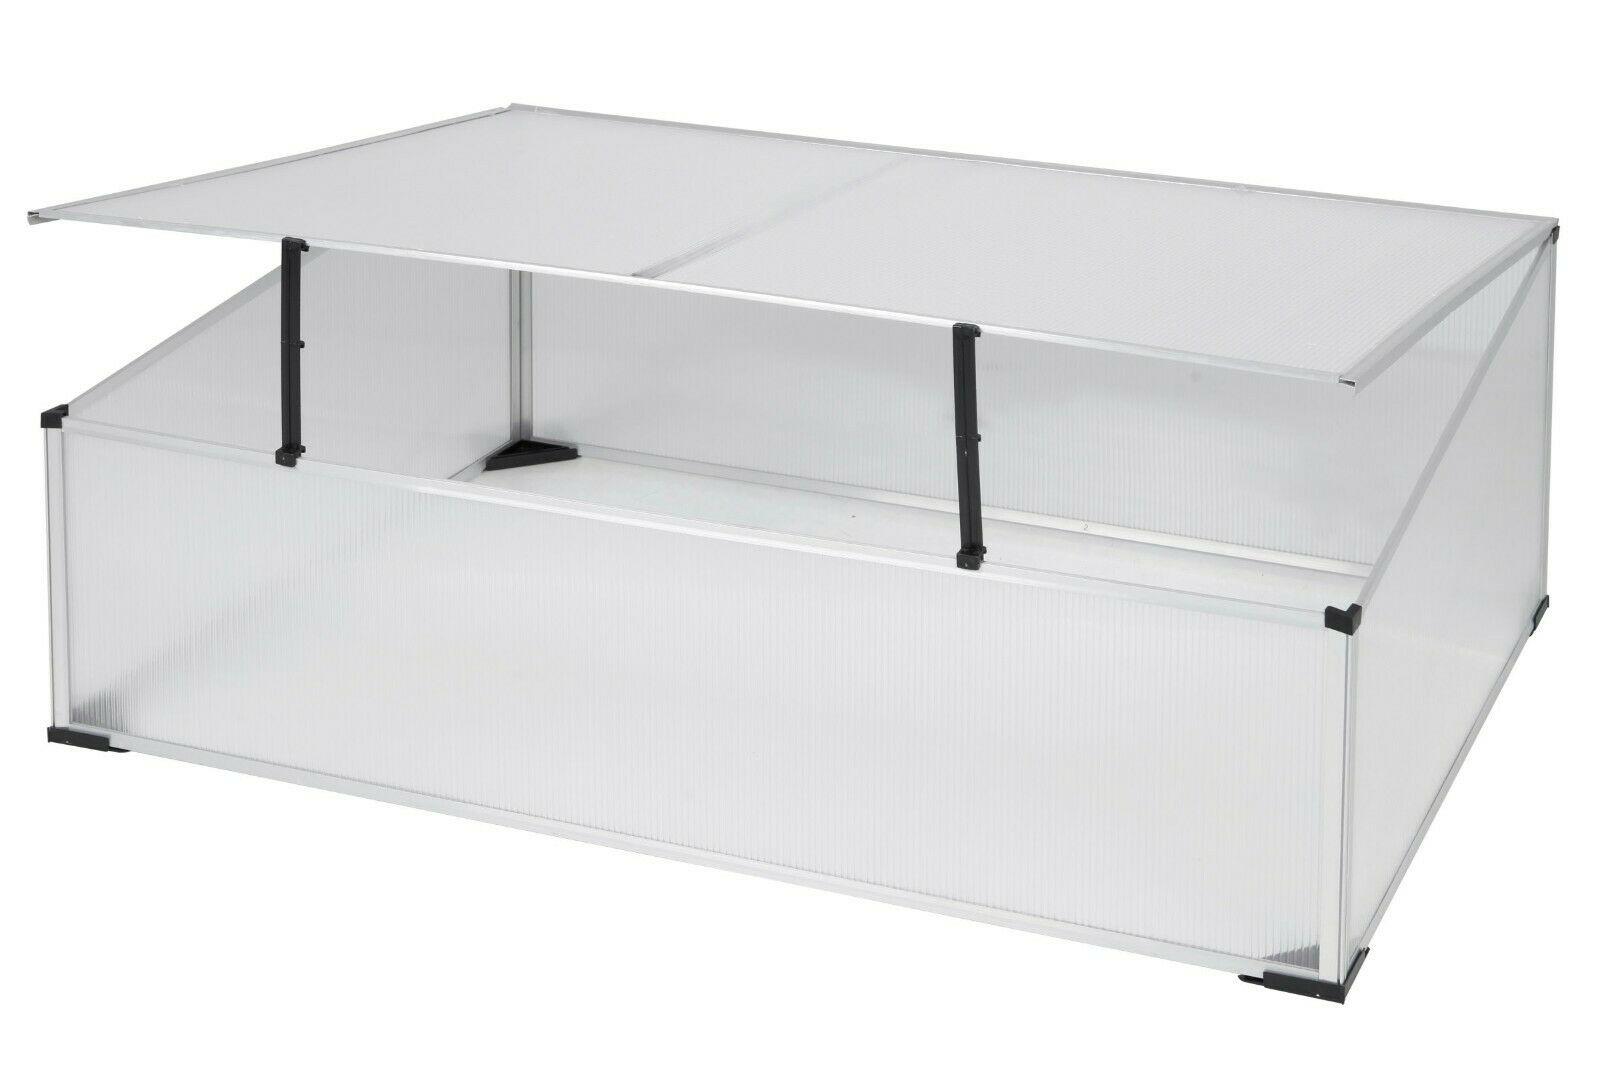 Linder Exclusiv Pařeniště MC4361 100x60x30/40 cm